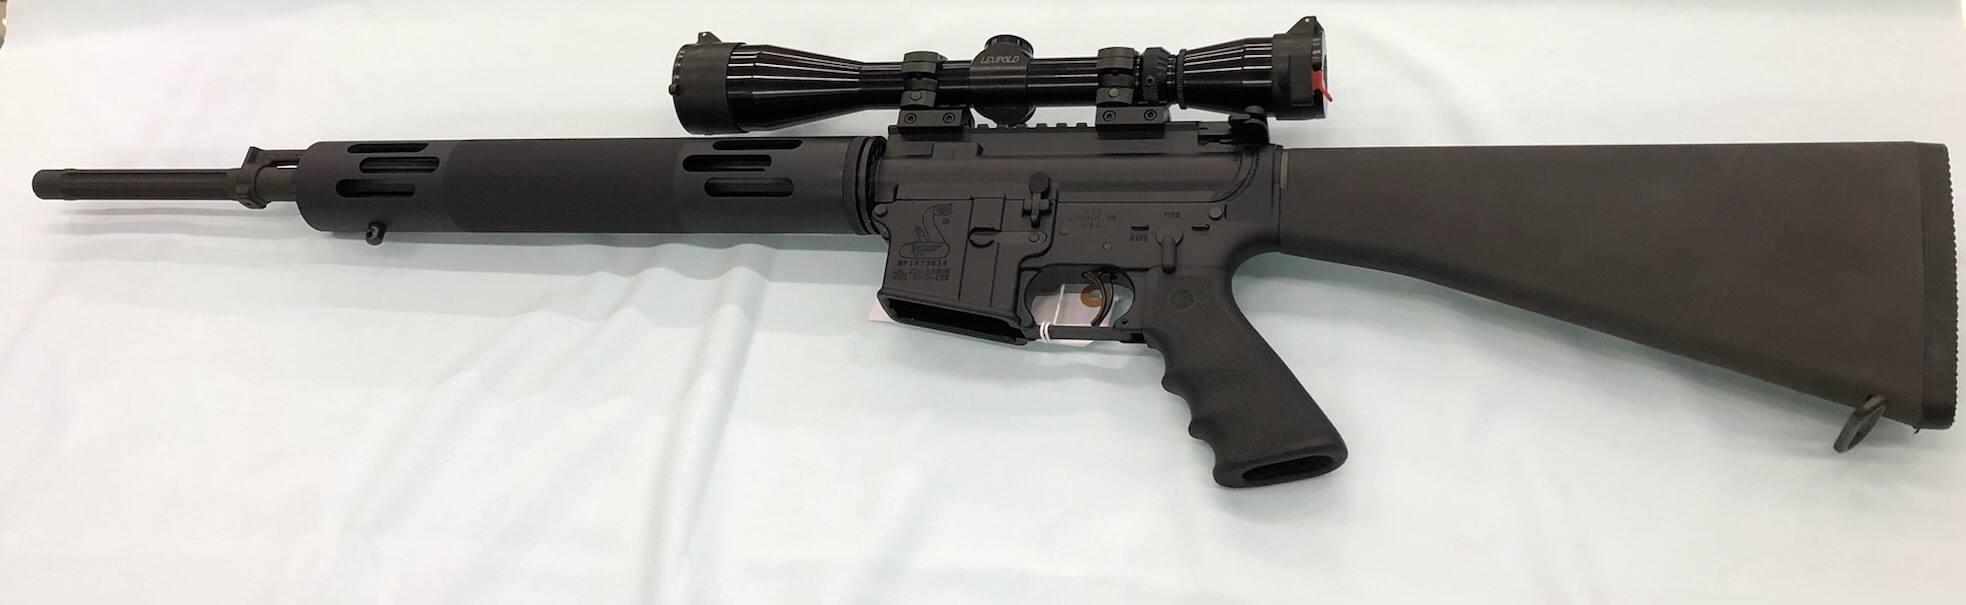 Image of BUSHMASTER Predator AR-15